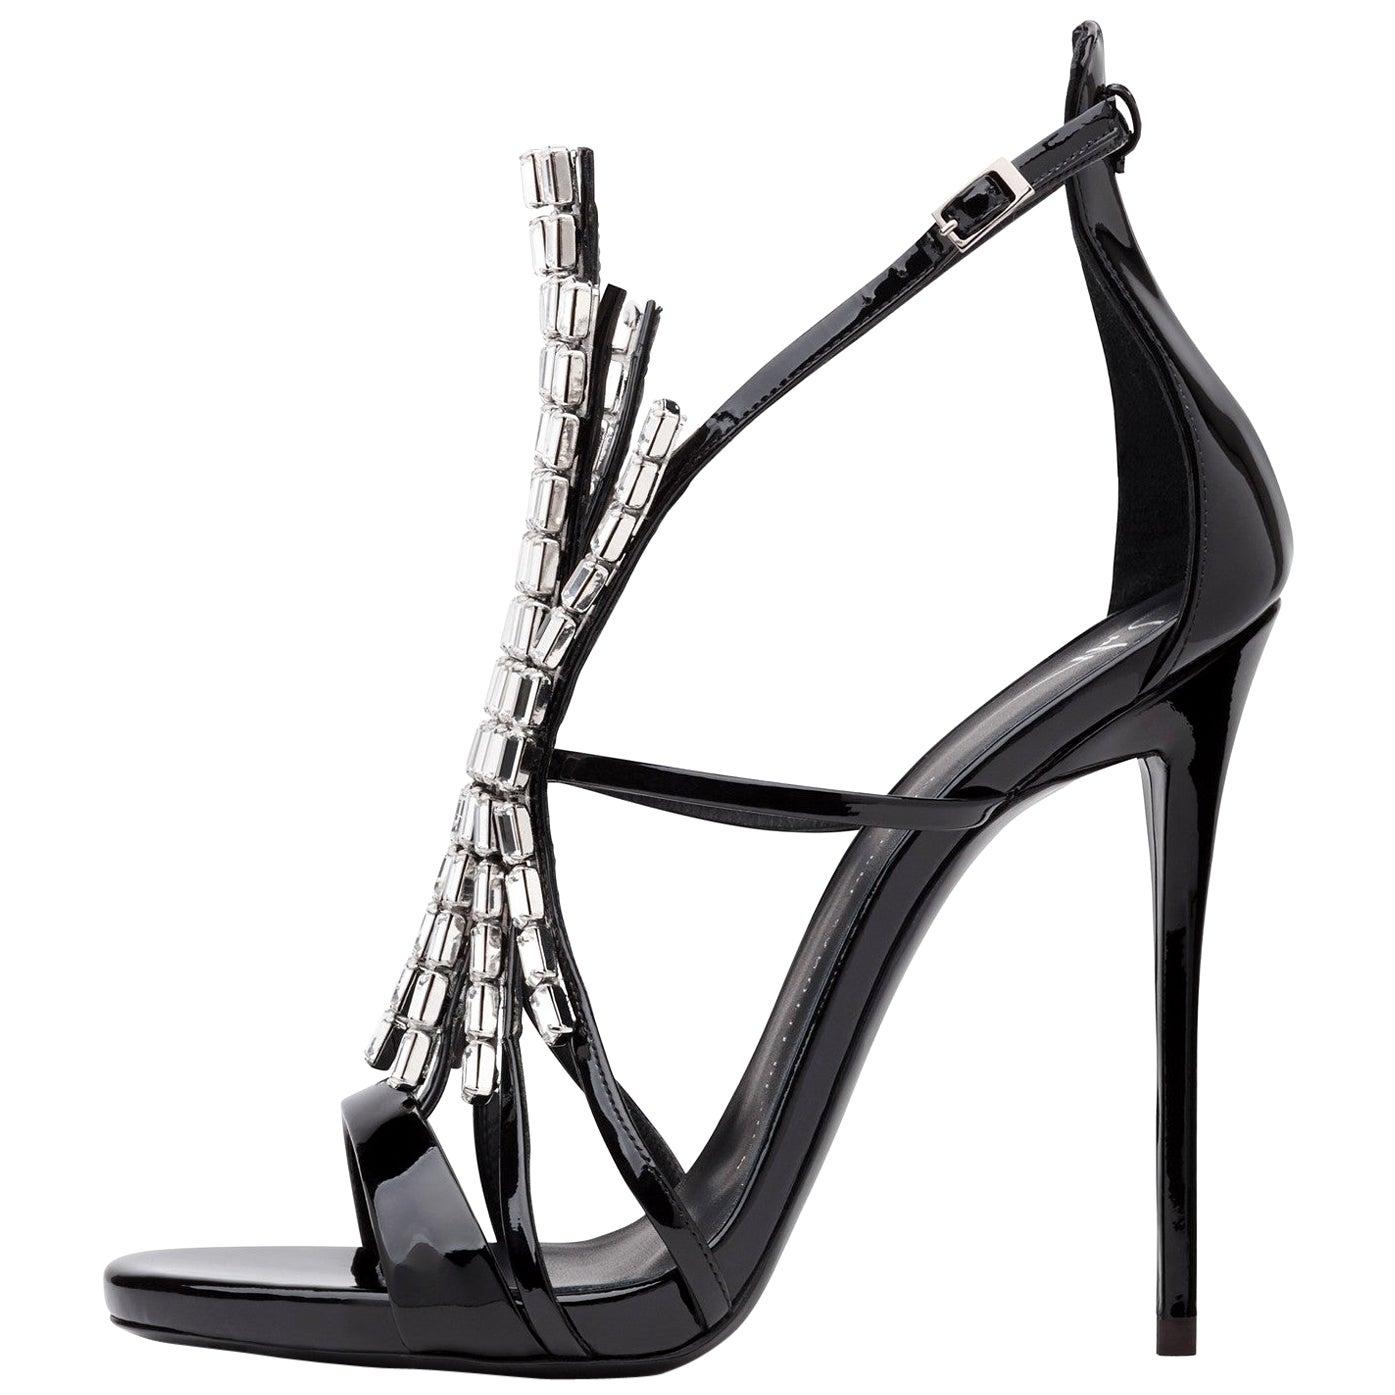 Giuseppe Zanotti NEW Black Patent Jewel Crystal Evening Heels Sandals in Box